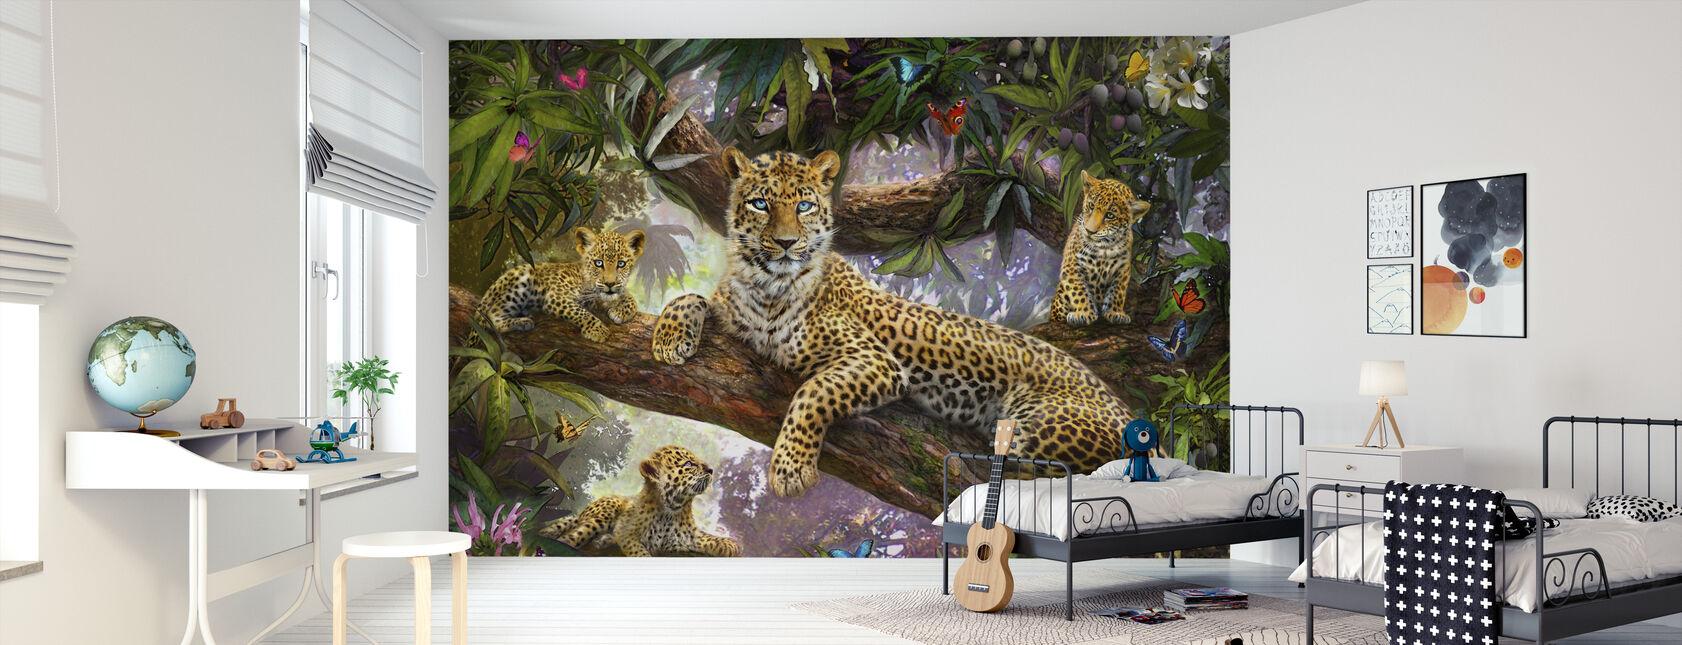 Tree Top Leopard Family - Wallpaper - Kids Room